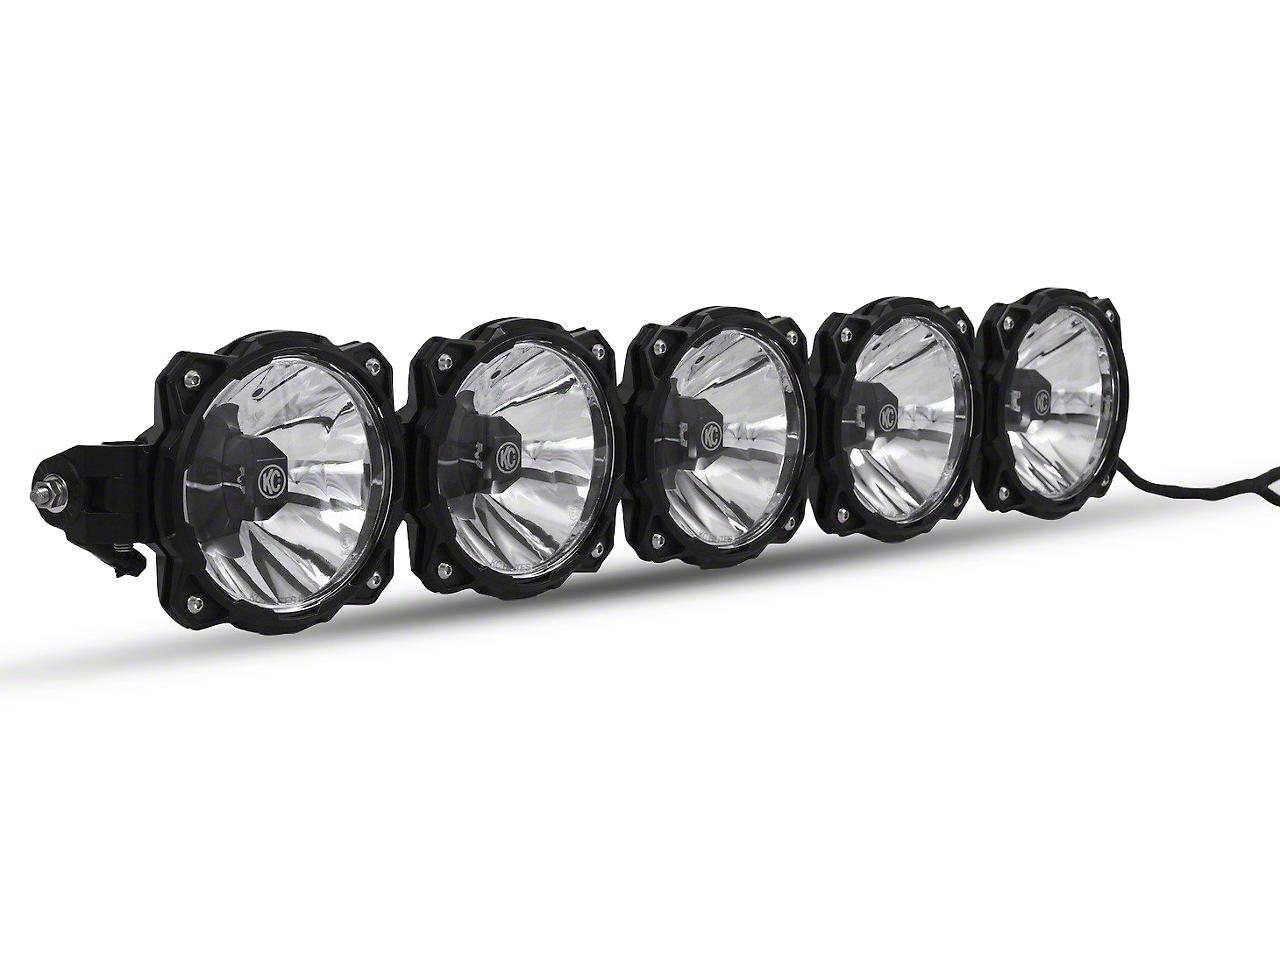 KC HiLiTES 39 in. Gravity Pro6 LED Light Bar - Combo Beam